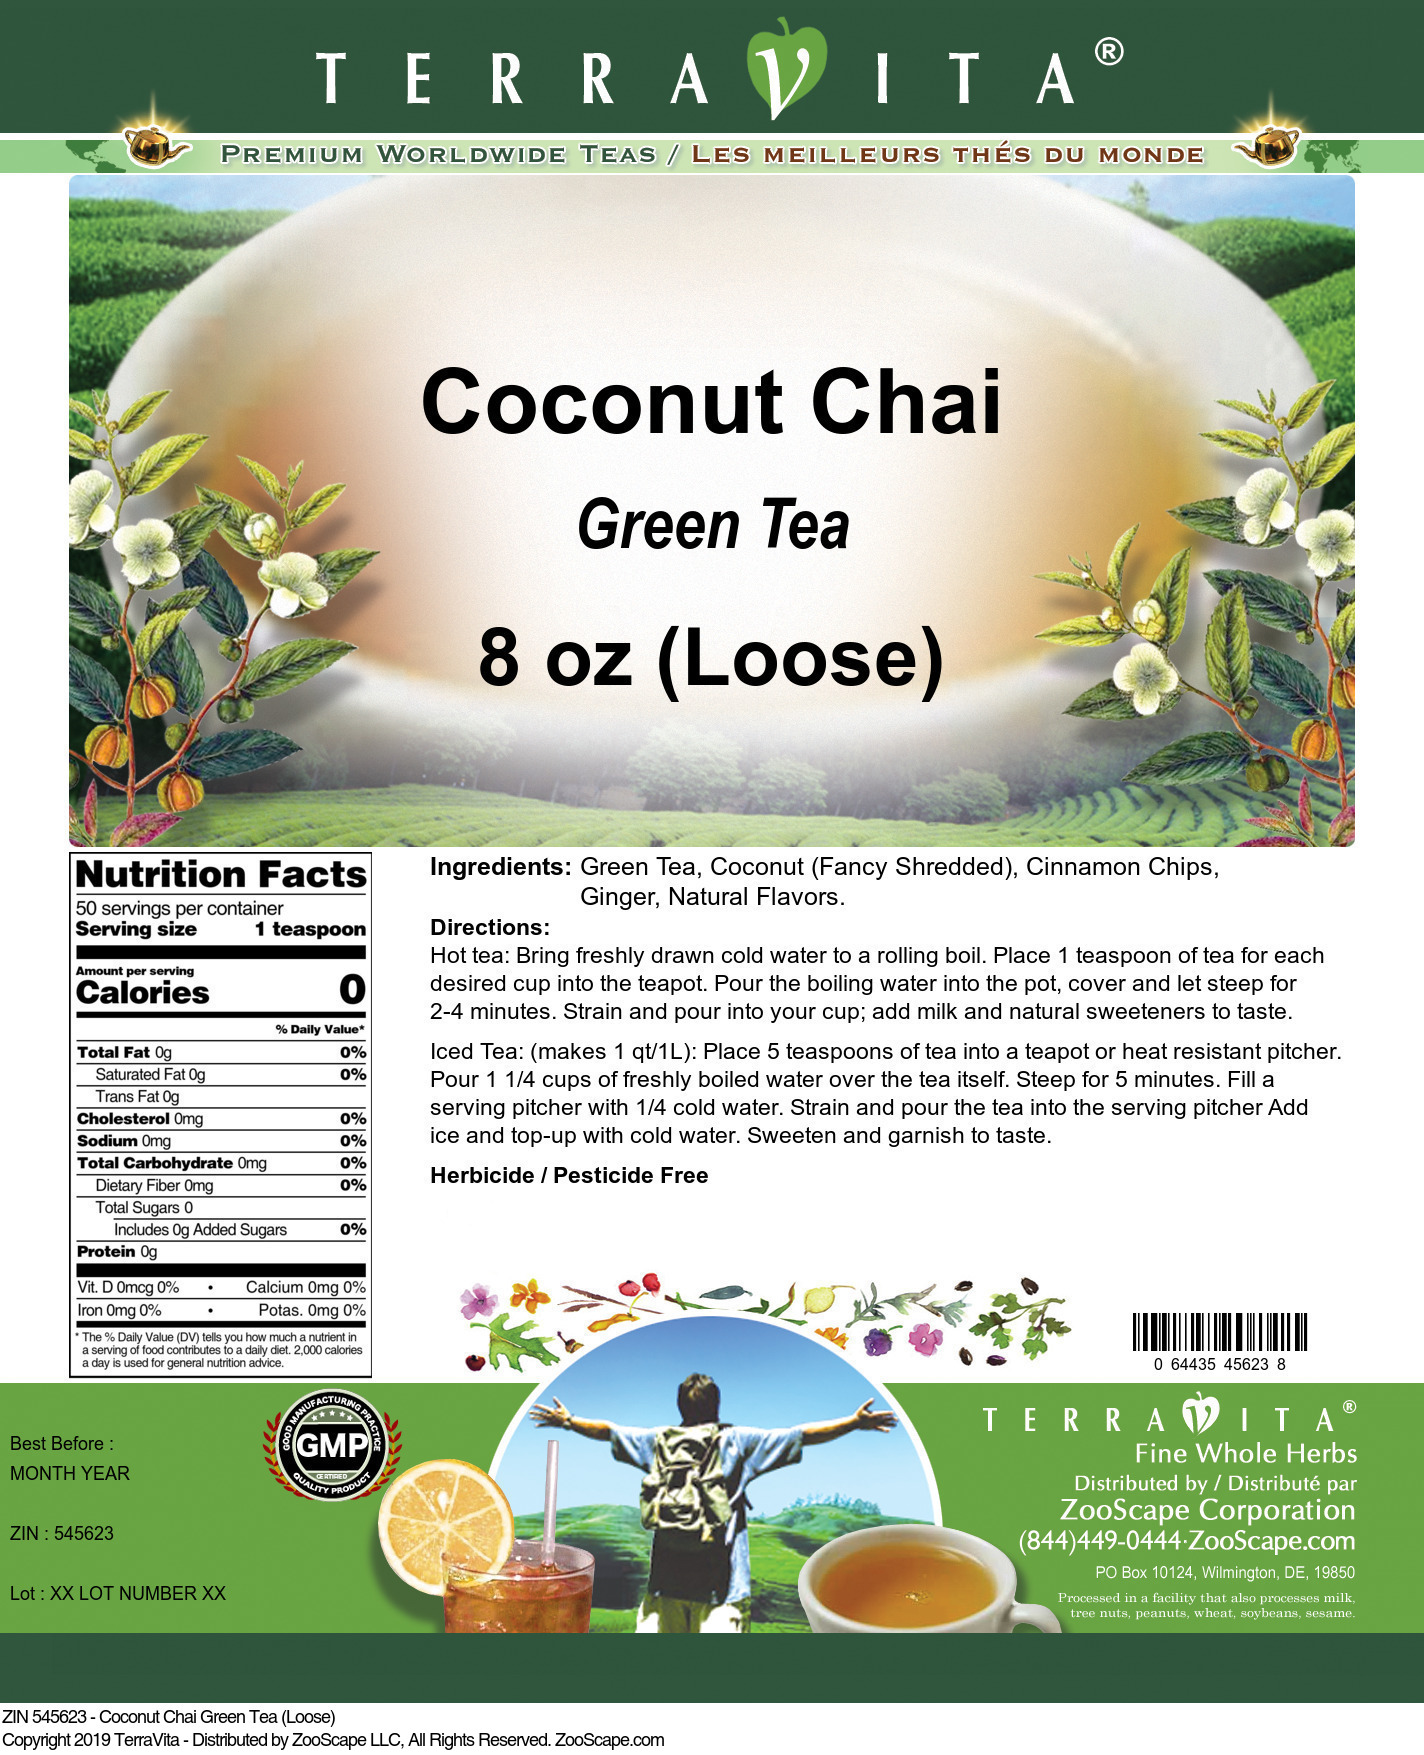 Coconut Chai Green Tea (Loose)